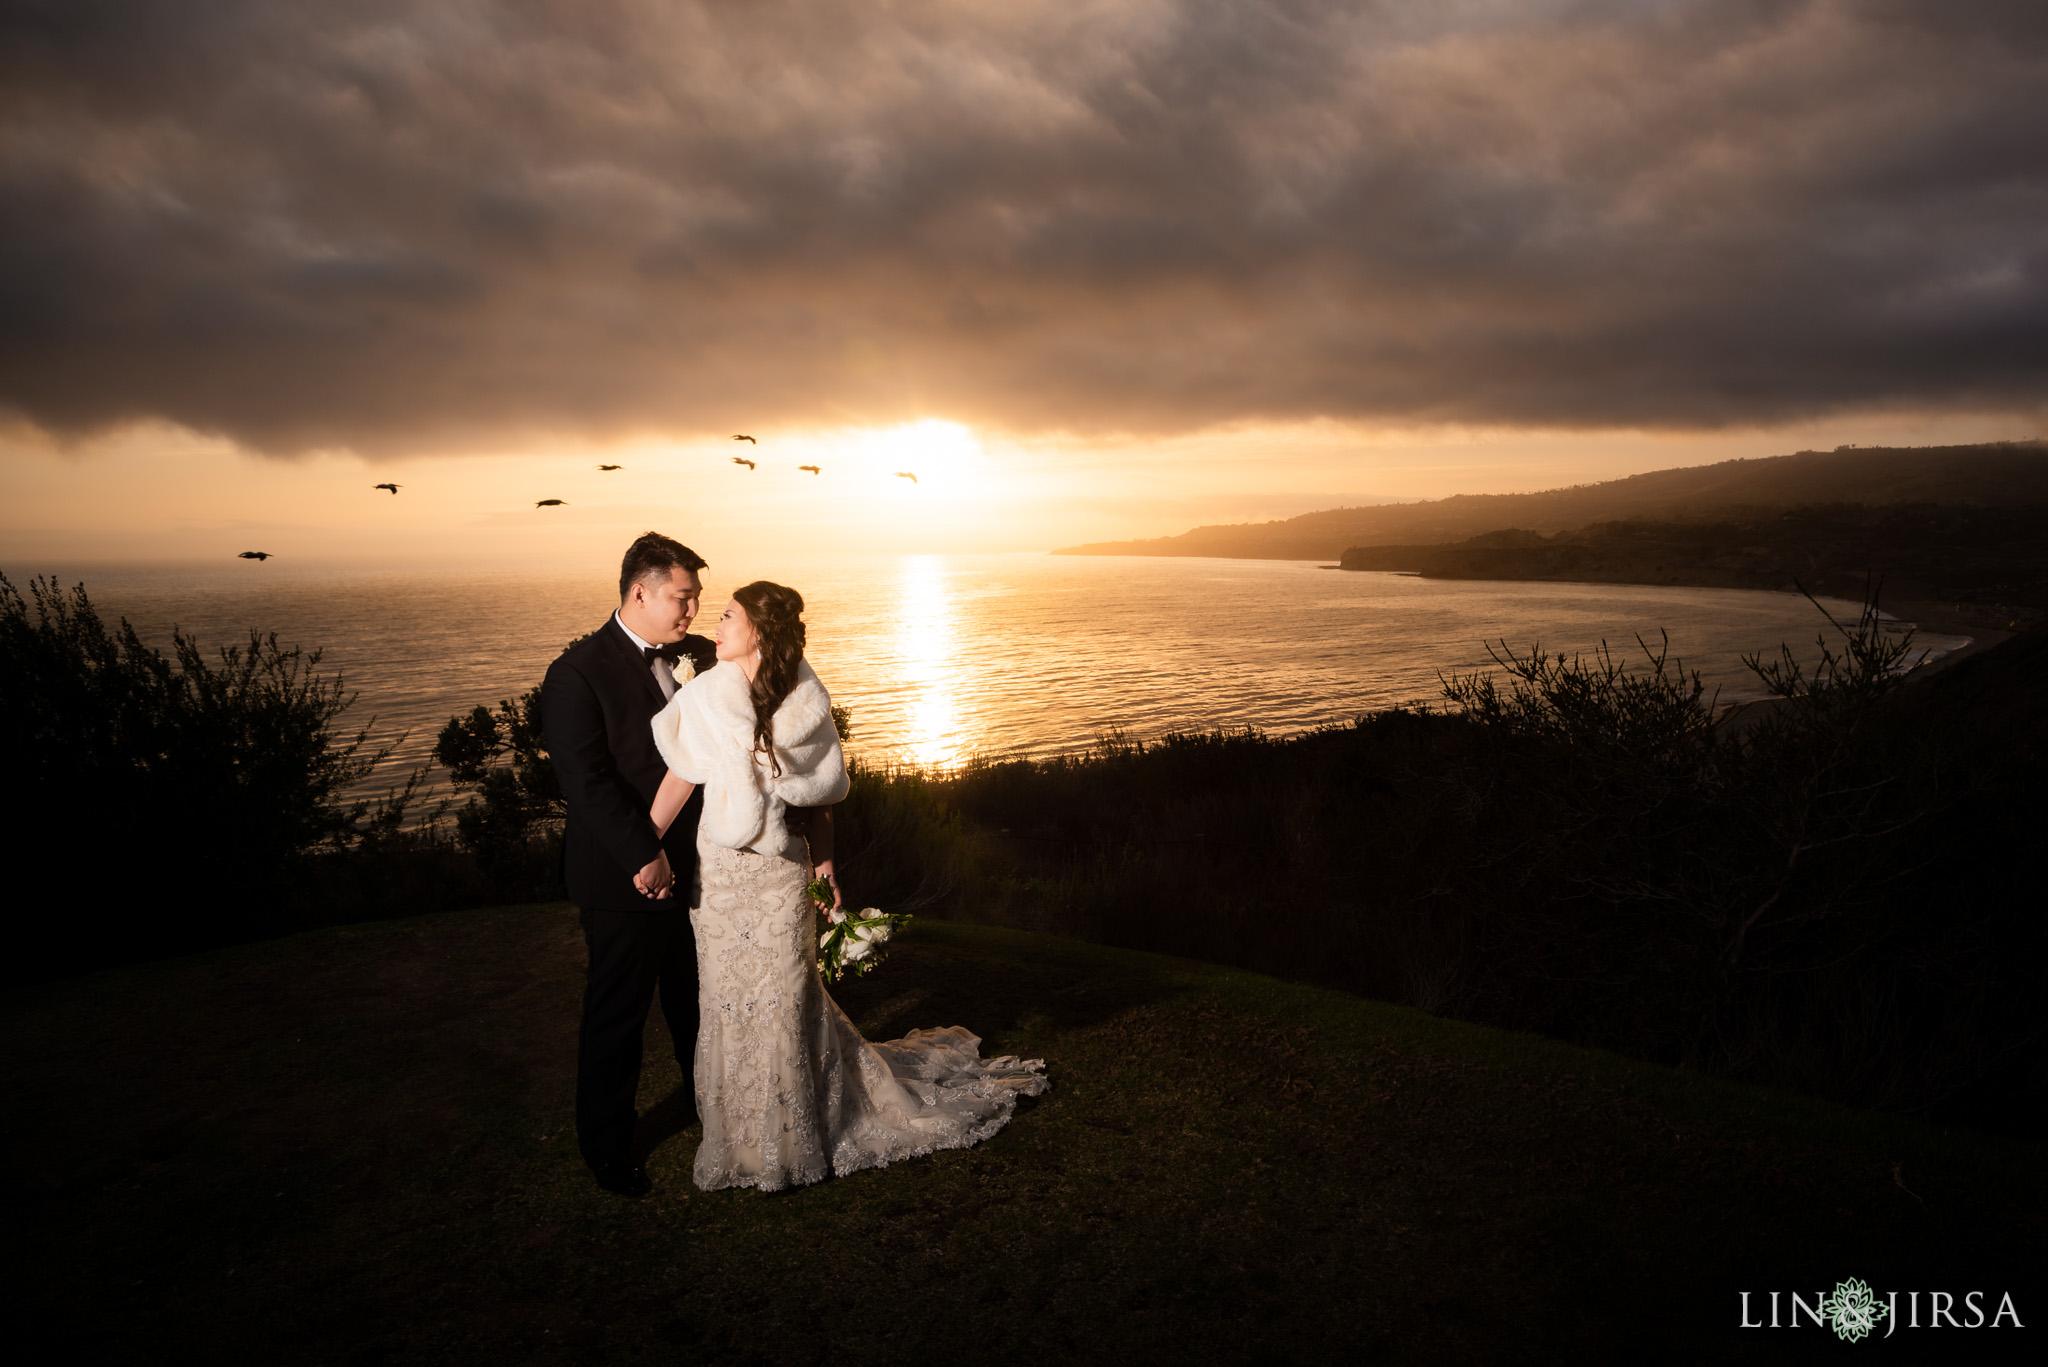 25 trump national golf club rancho palos verdes wedding reception photography